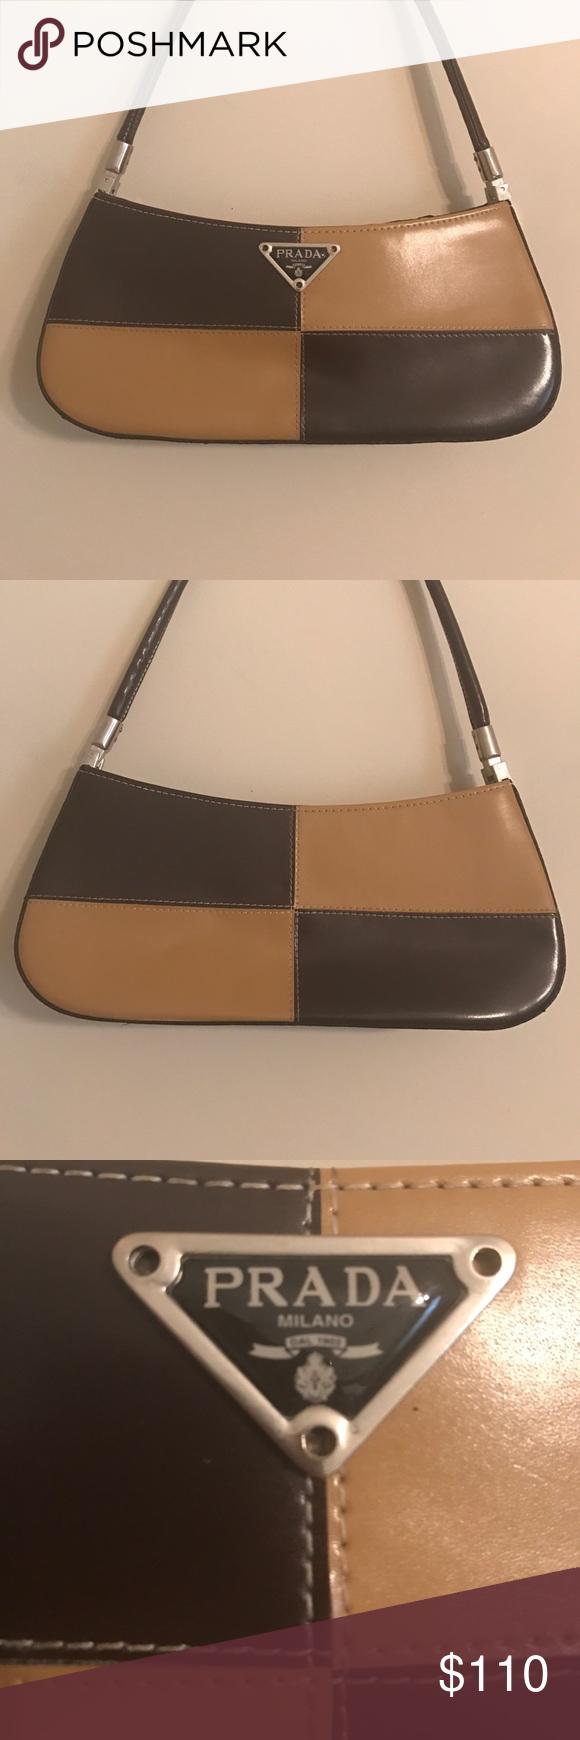 a17cf70f779f ... coupon vintage leather prada handbag brown and tan handbag shoulder bag  theres an prada milano a112d